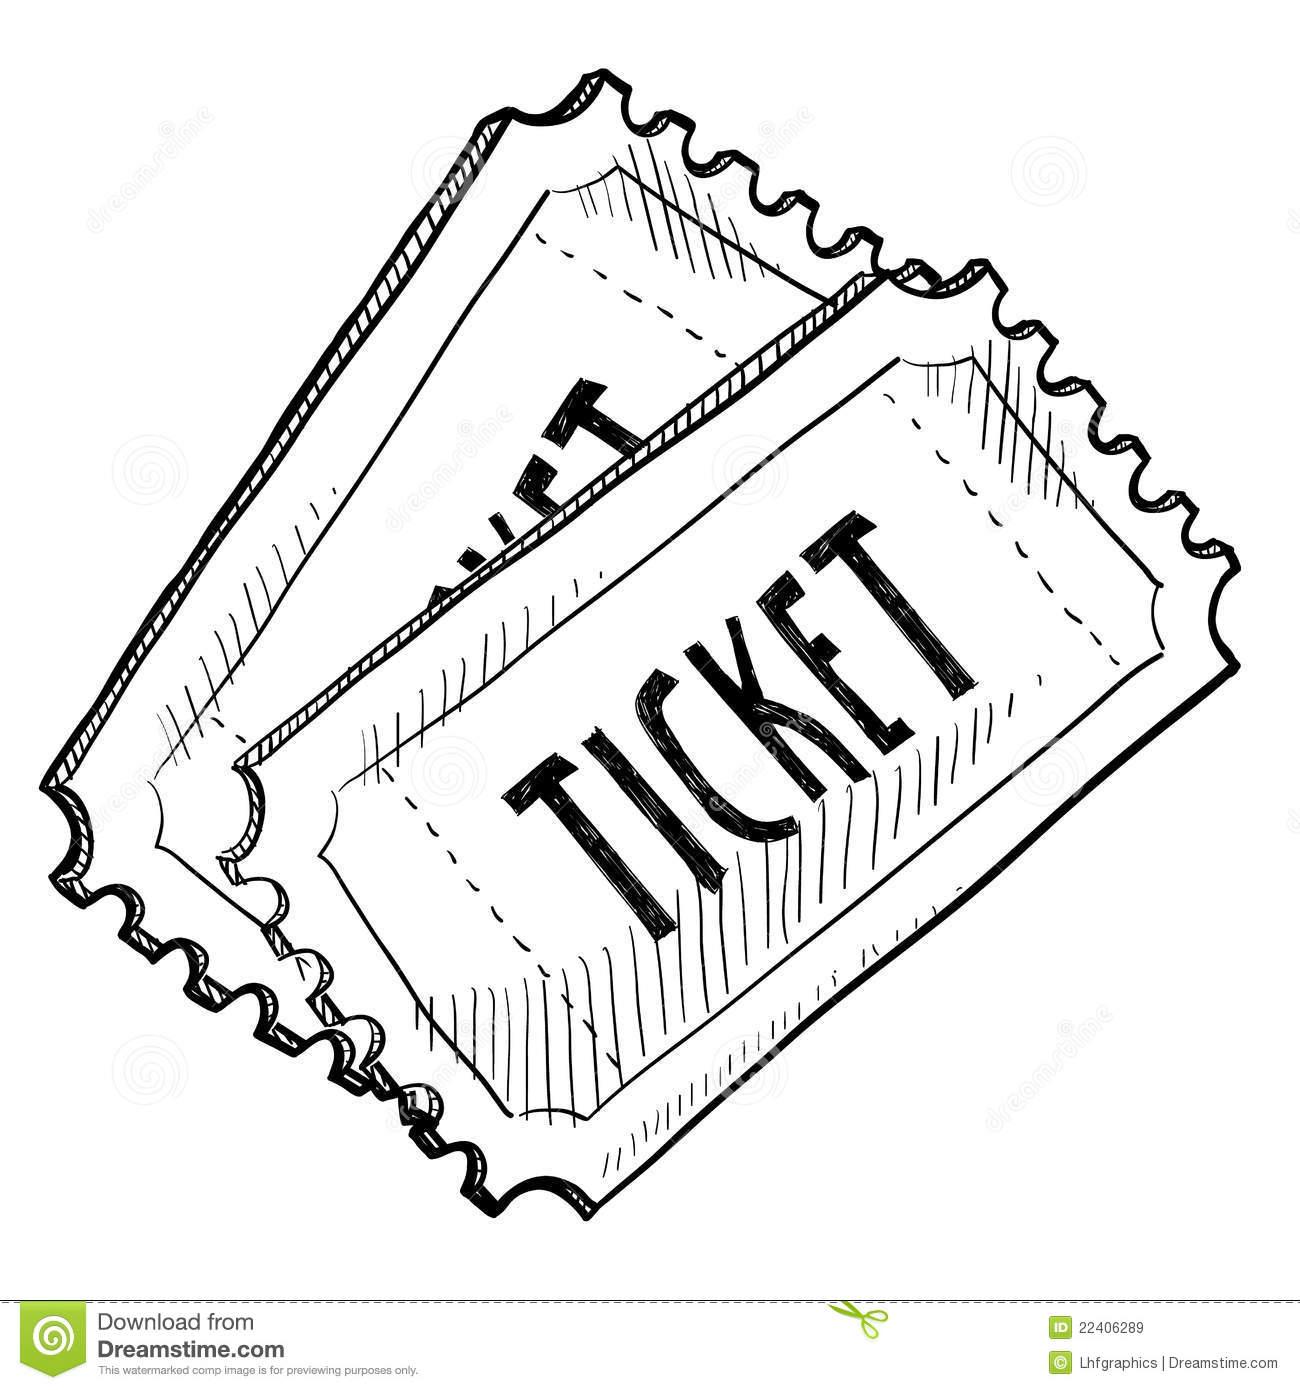 Concert clipart event ticket, Concert event ticket.